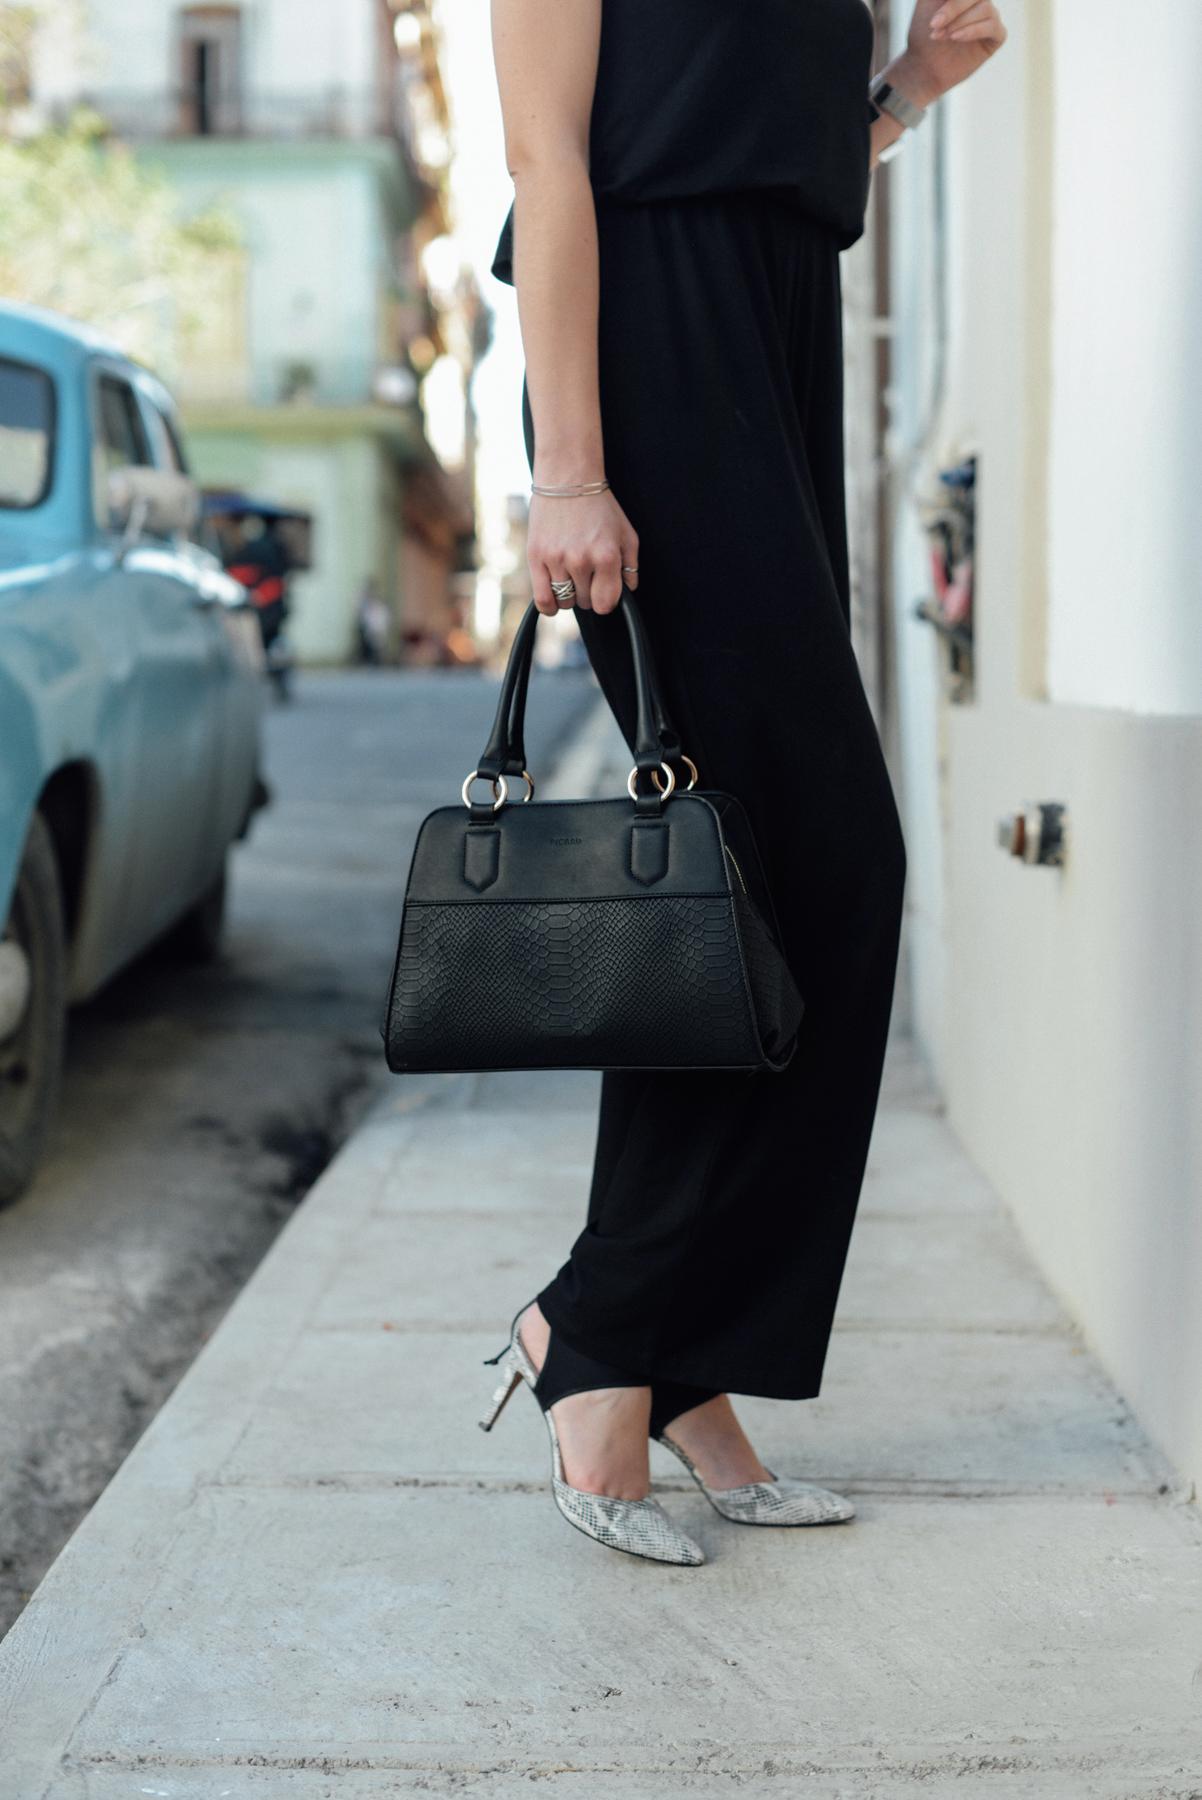 Kiamisu_Modeblog_Fashionblog_Alba Moda_Jumpsuit_Havanna_La Haban Vieja_Kuba Outfit-final5